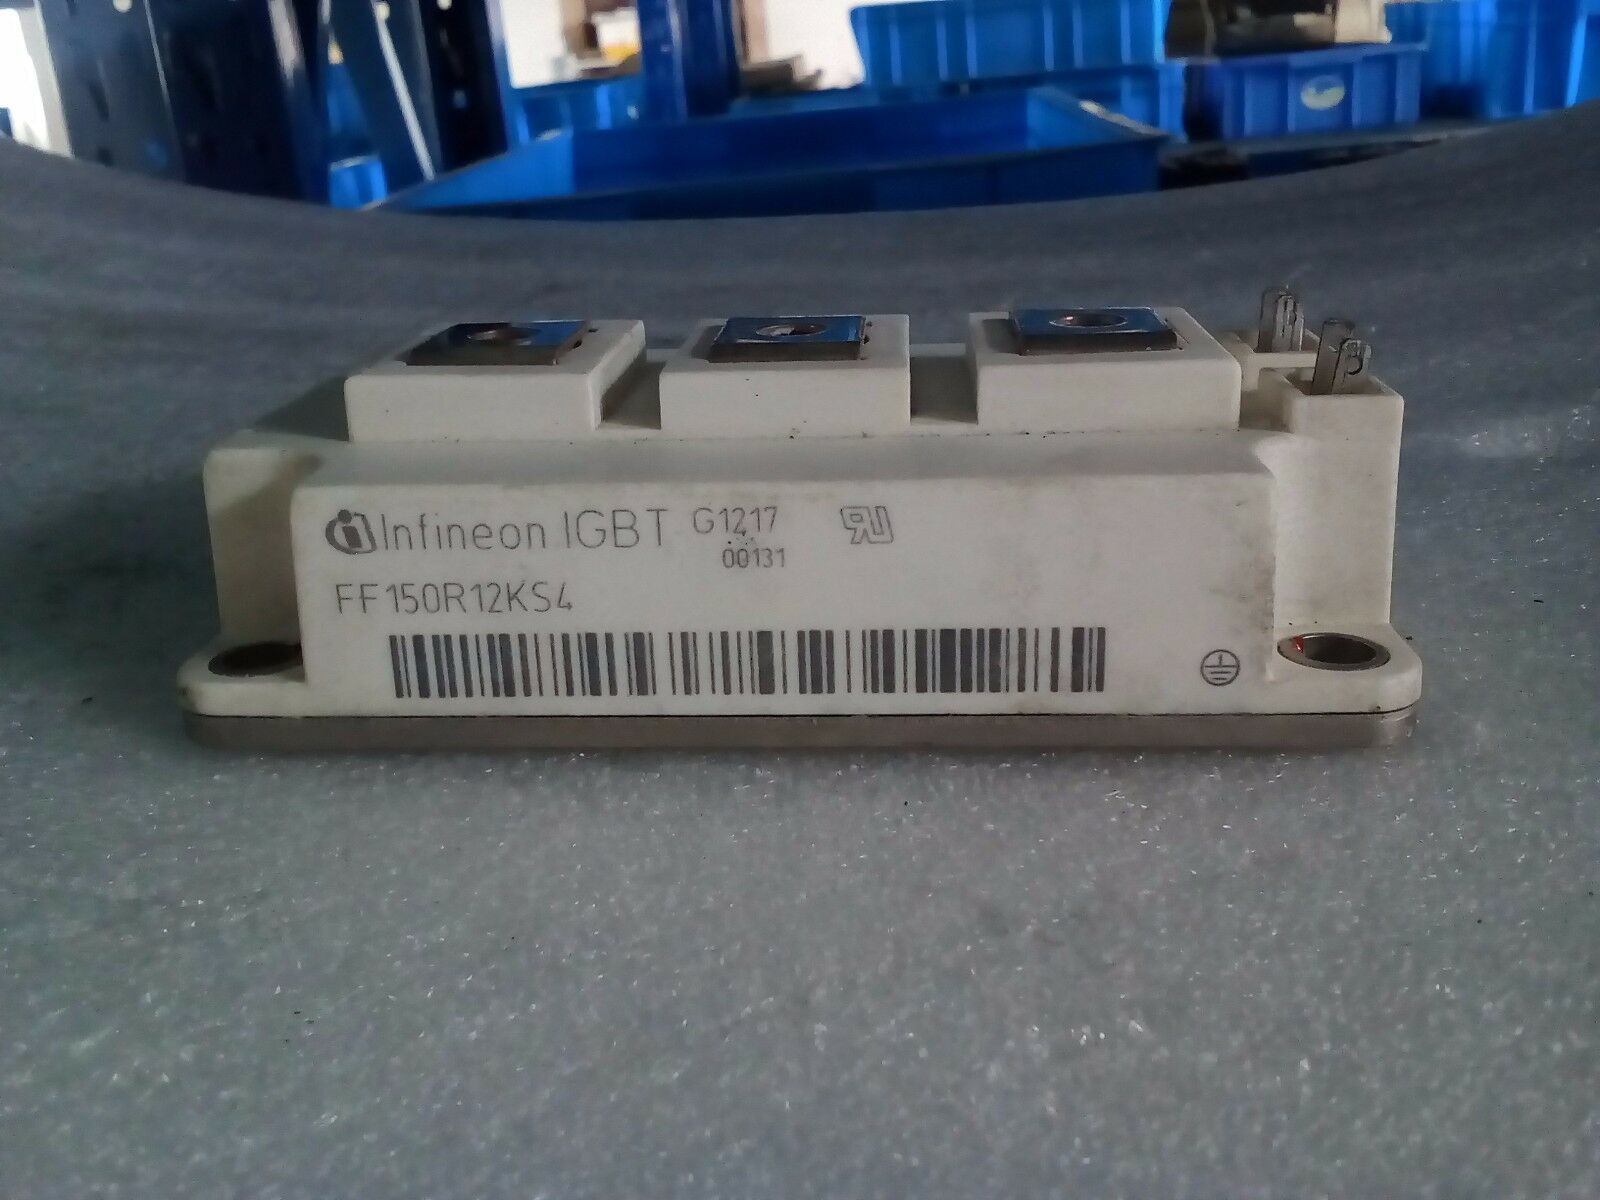 1PC Used Infineon IGBT MODULE FF150R12KS4